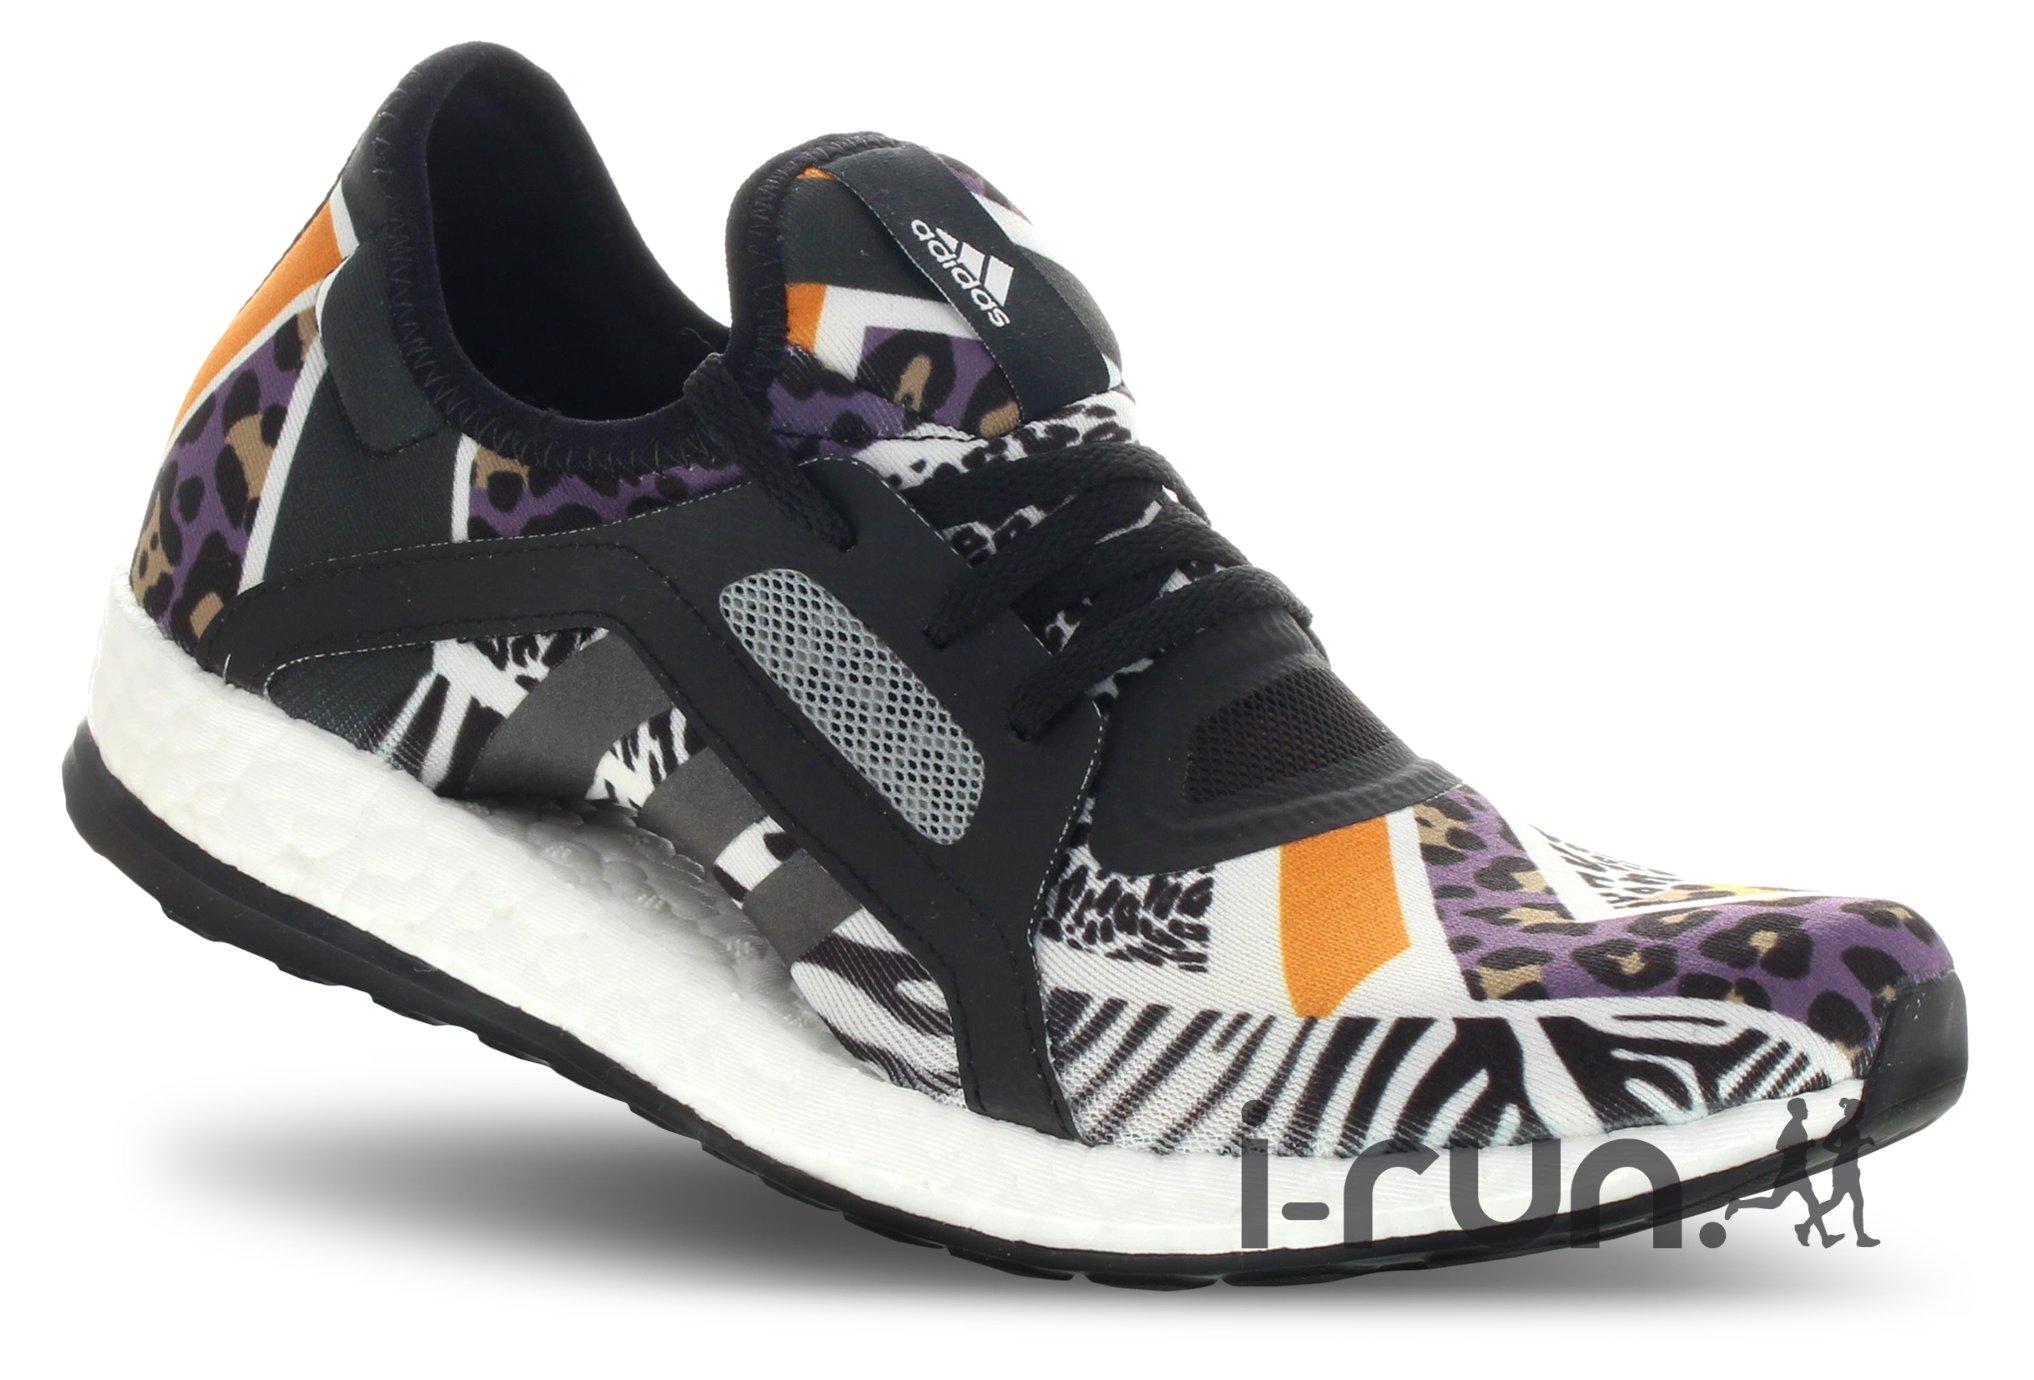 Adidas Pureboost x w diététique chaussures femme